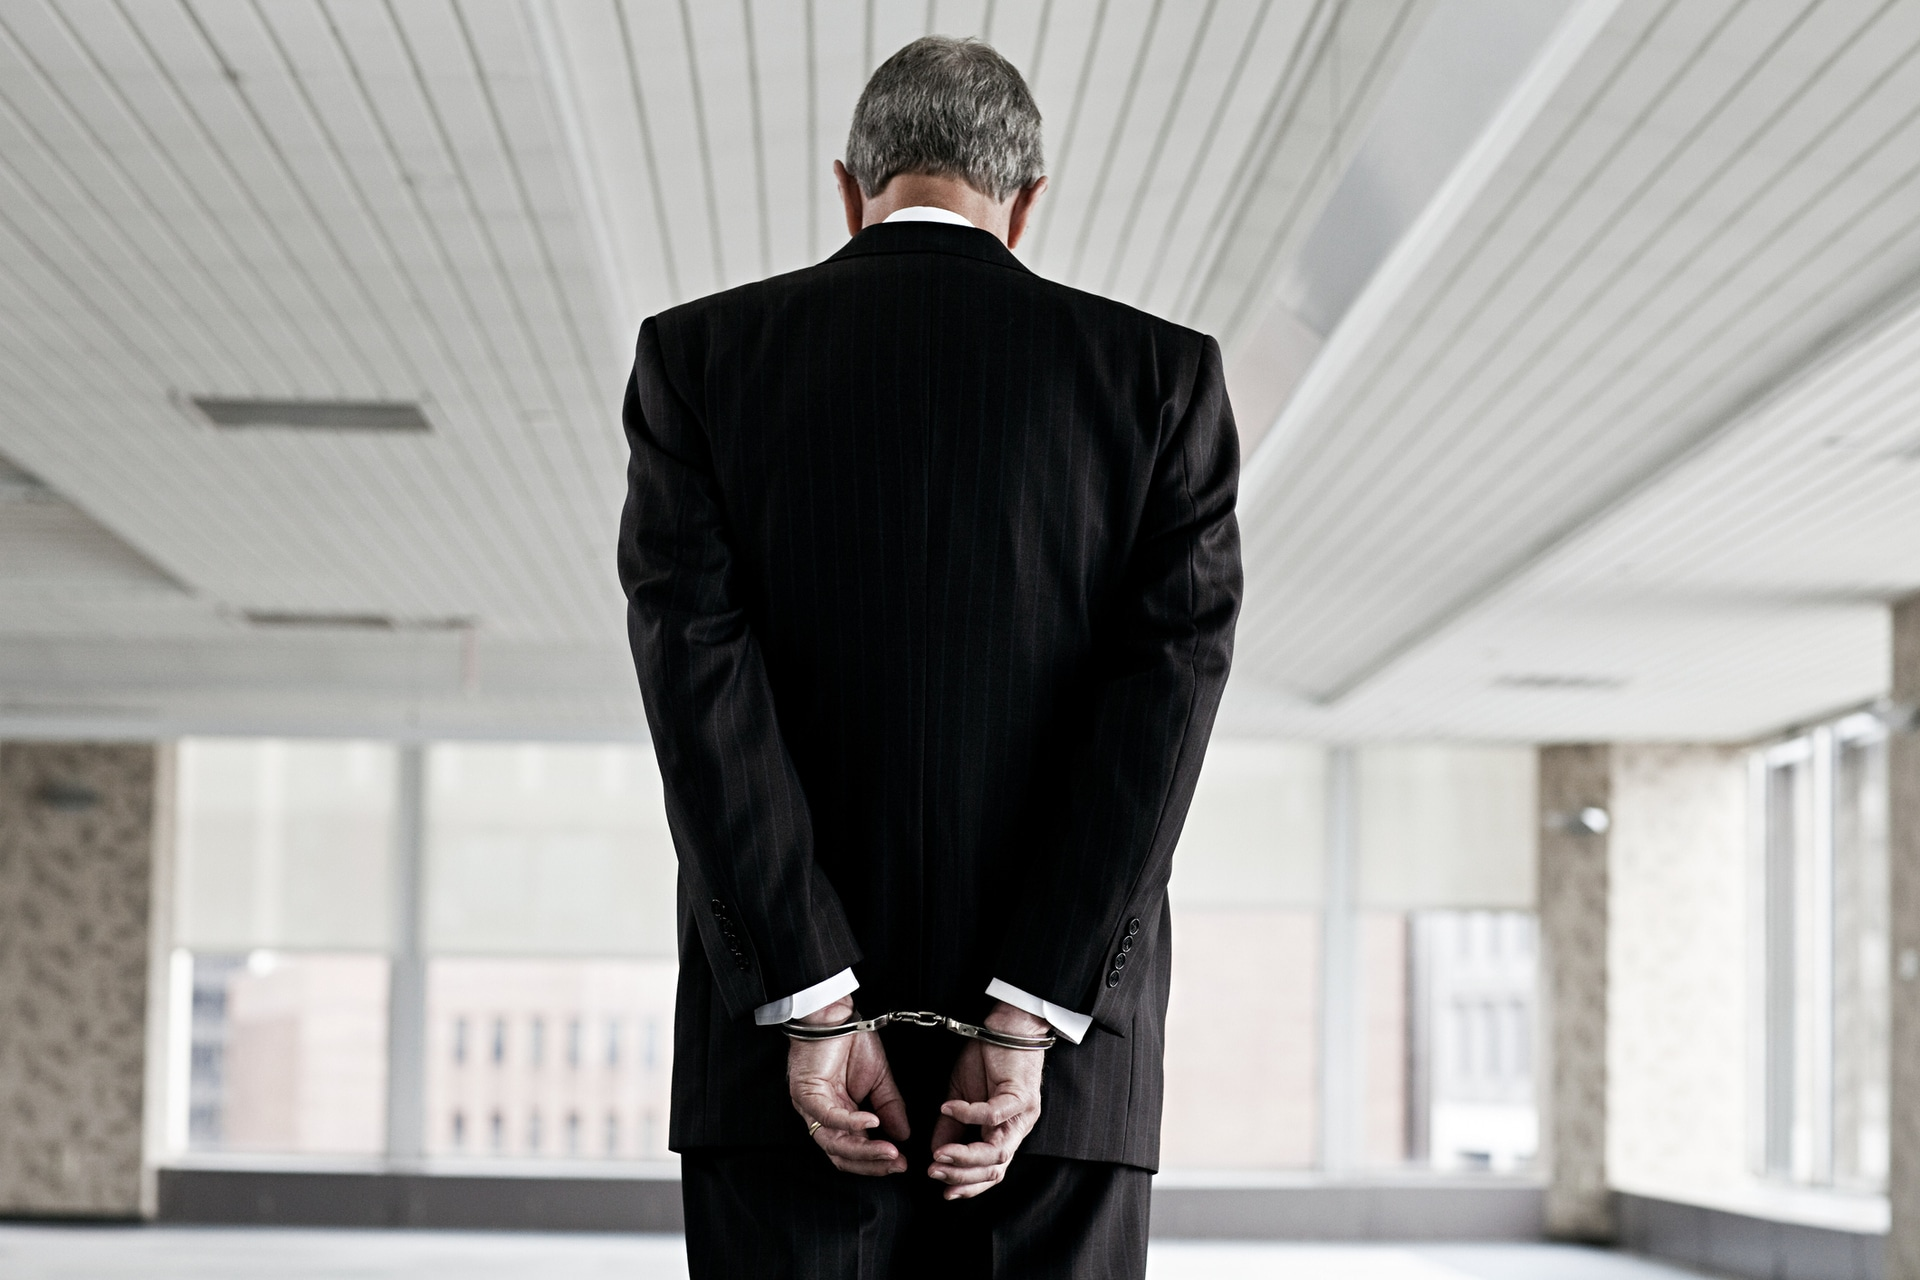 White-Collar Crime Statistics